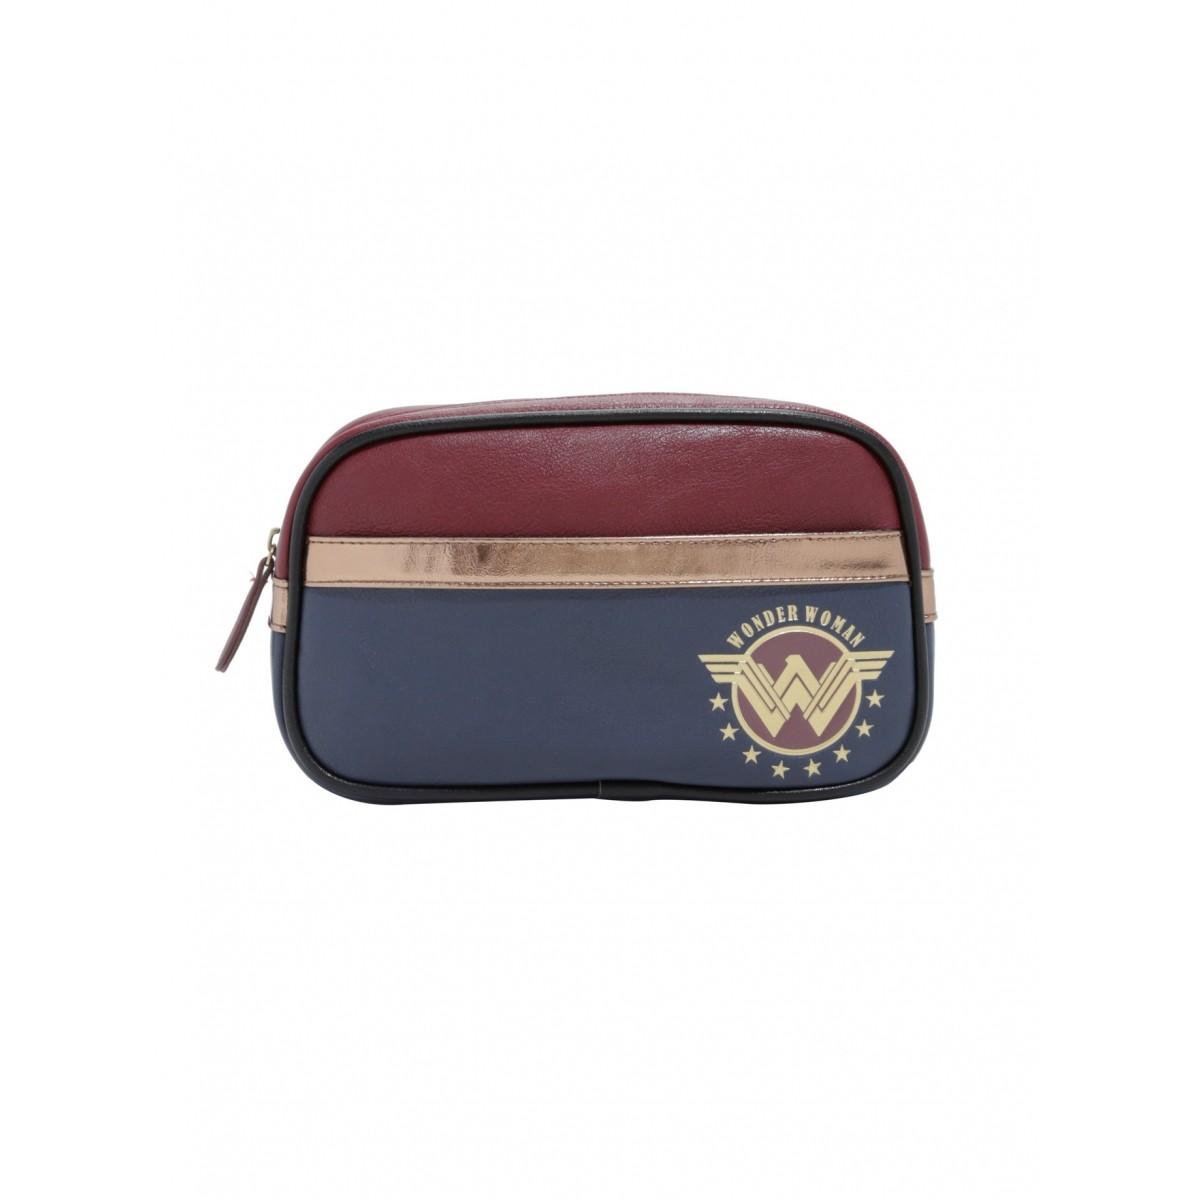 EM BREVE: Bolsa de Maquiagem (Makeup Bag) Mulher Maravilha (Wonder Woman): DC Comics